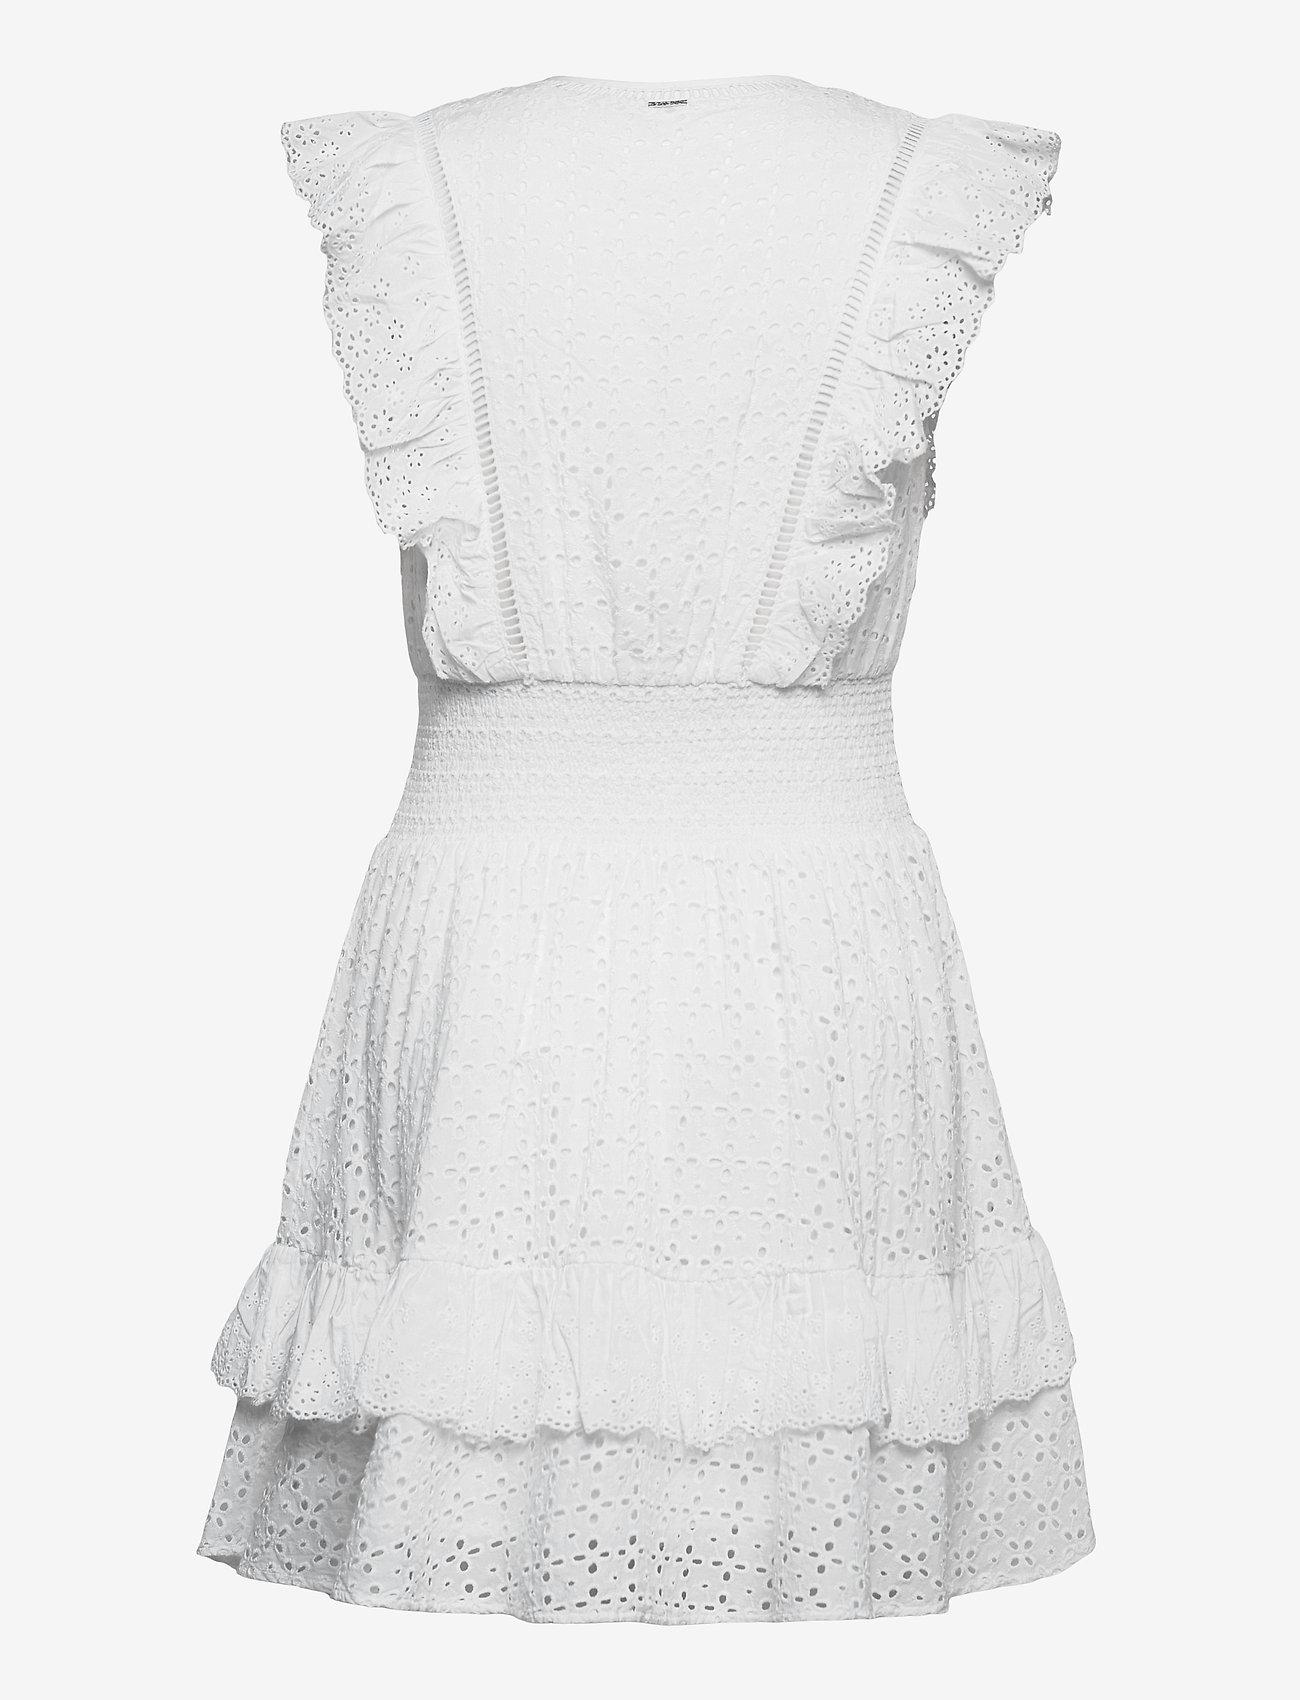 GUESS Jeans - AISHA DRESS - sommerkjoler - true white a000 - 1